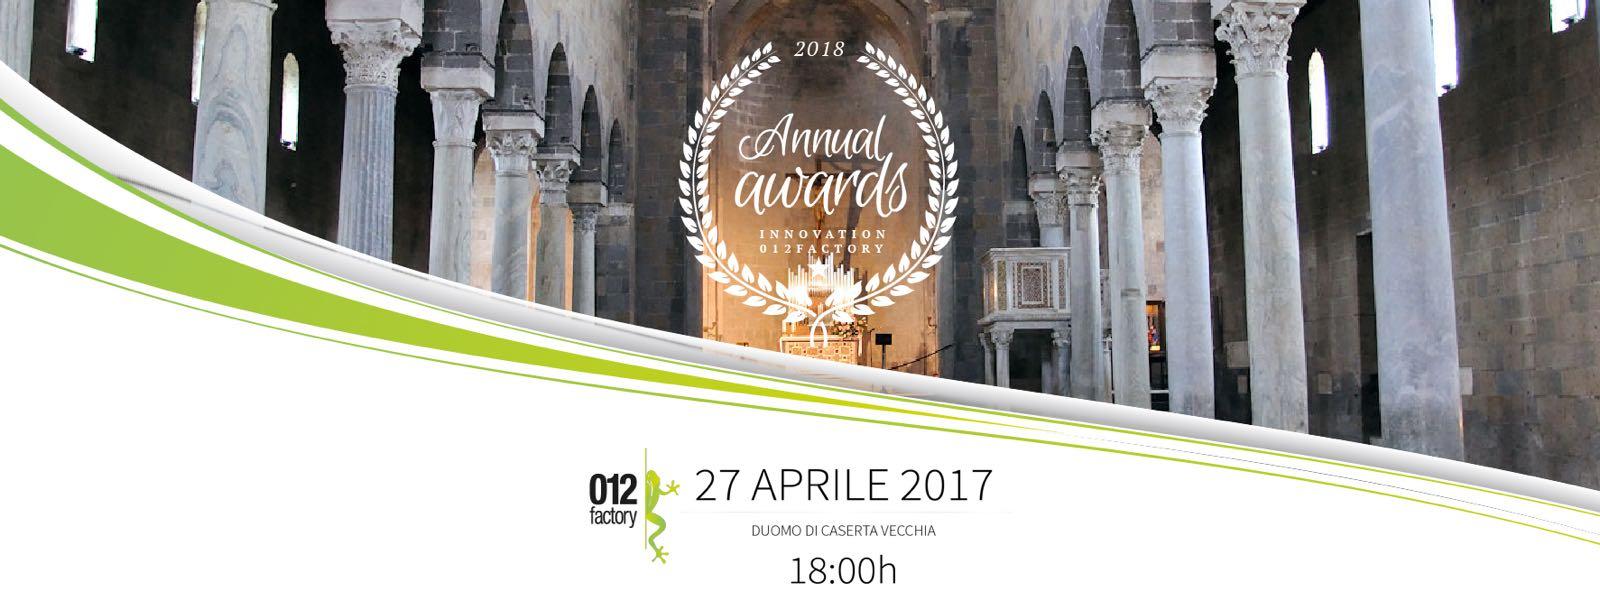 "Premio ""Mario Diana"" Award Innovation 2018"